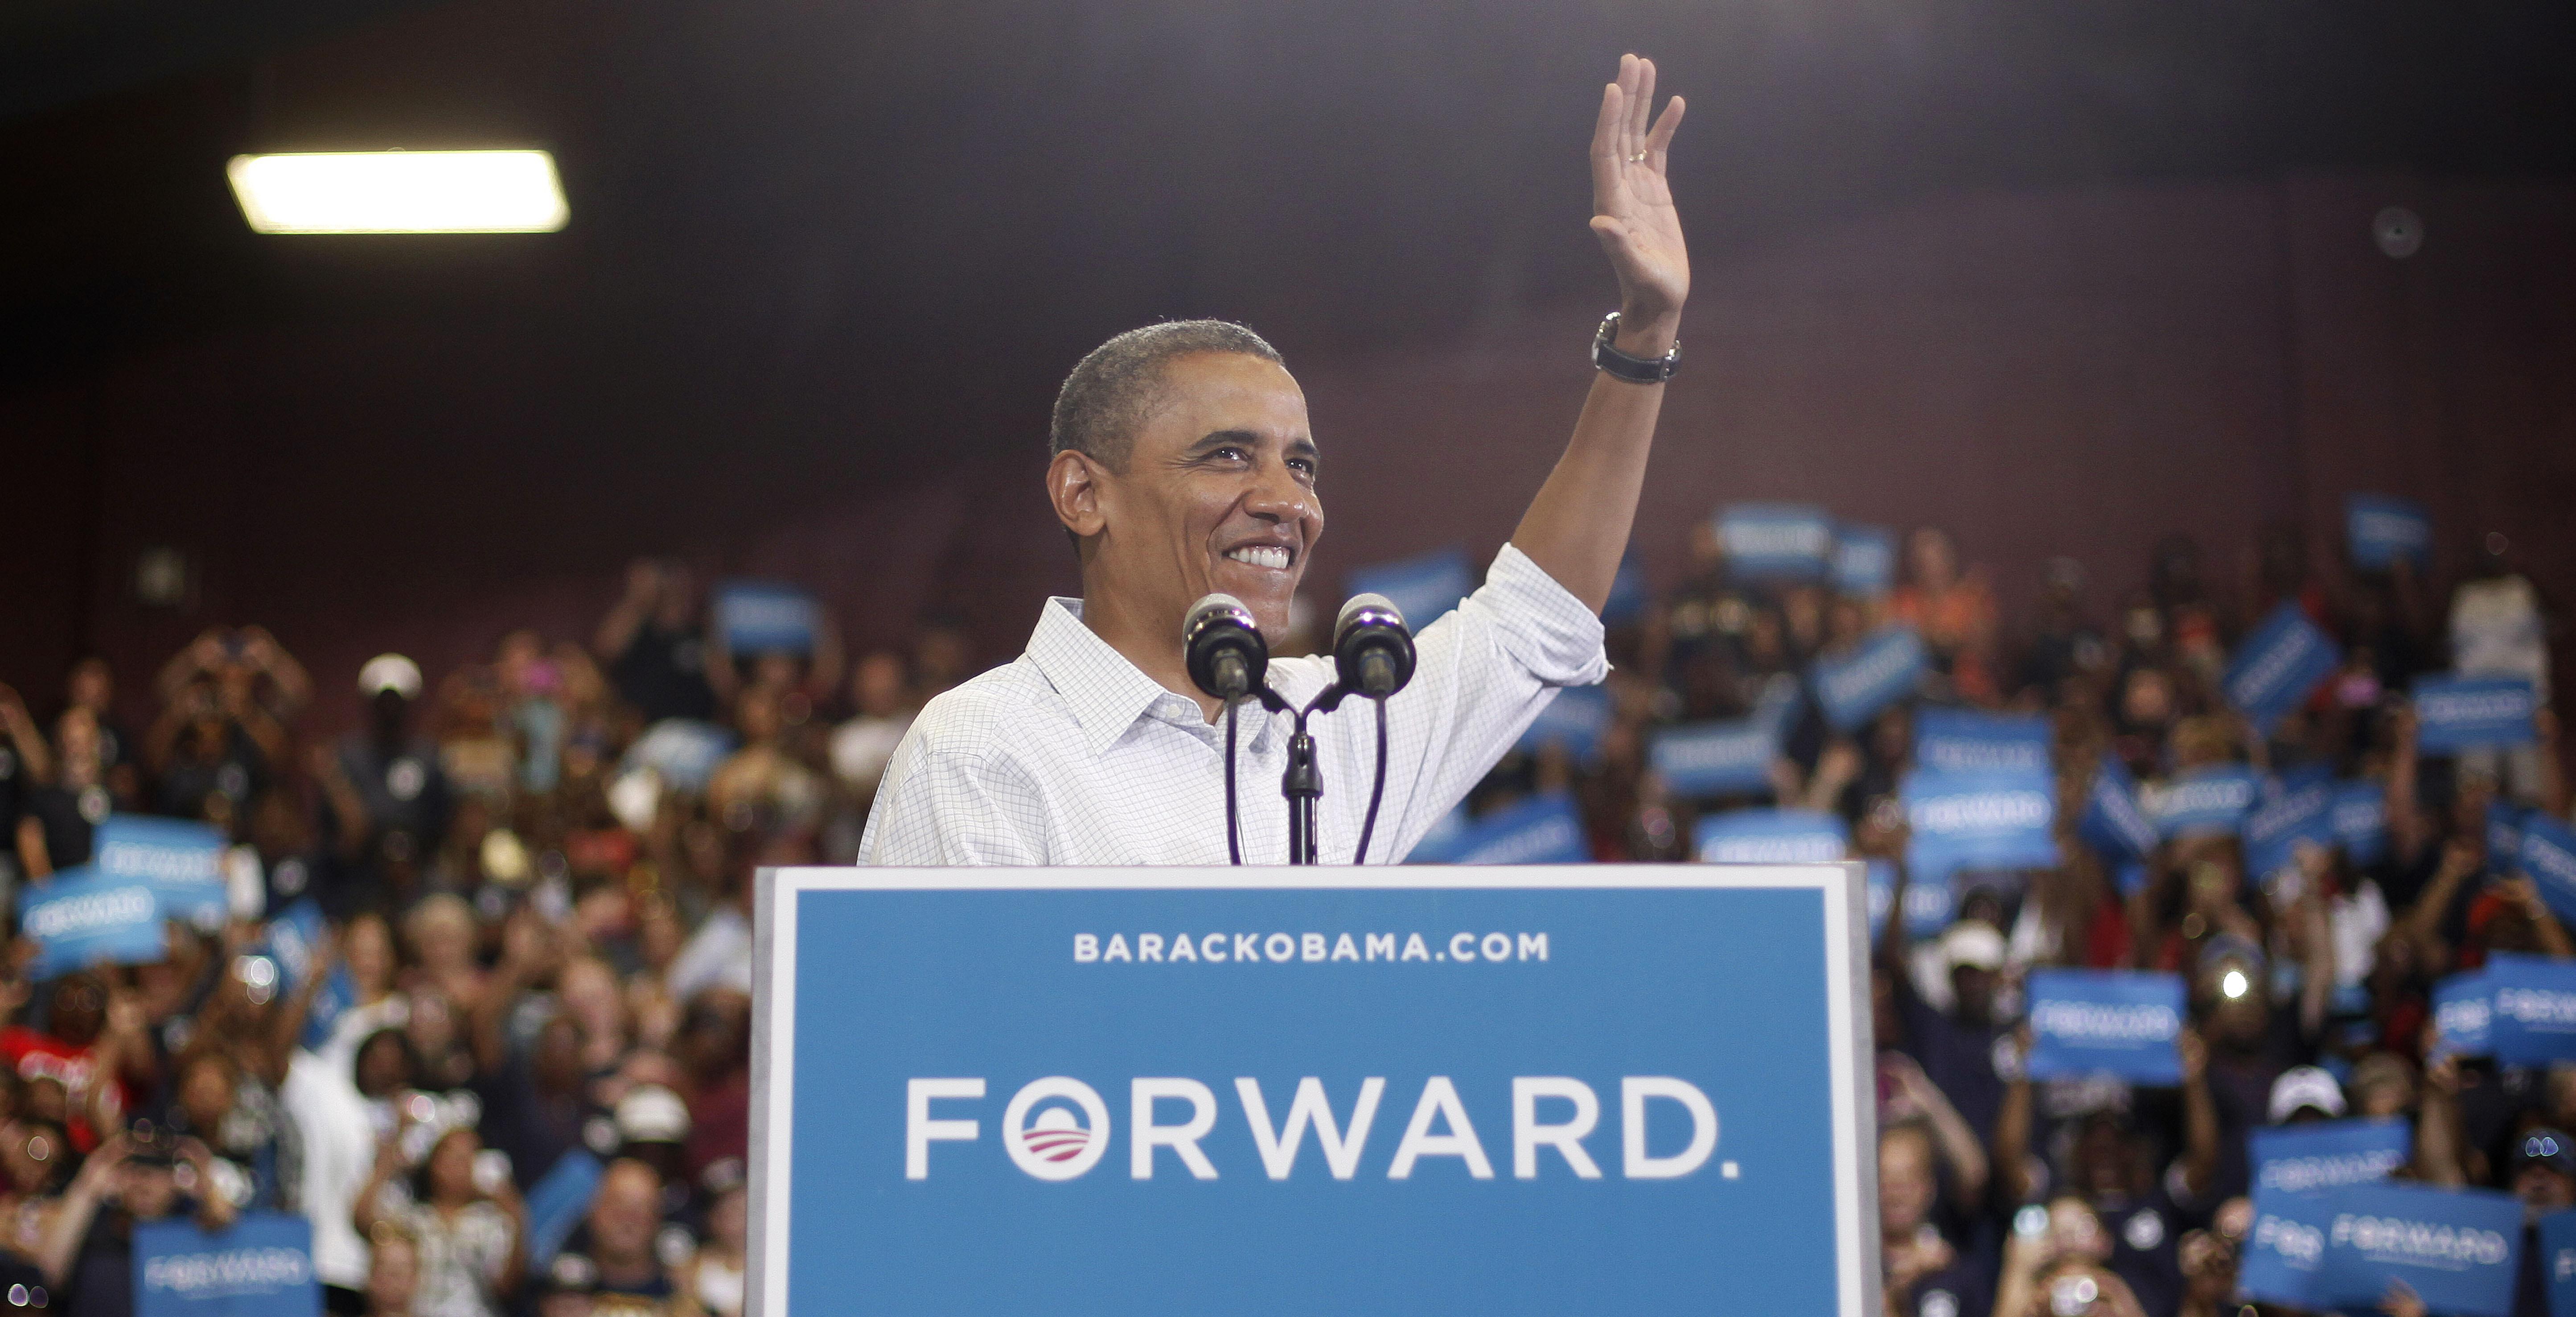 Obama campaign speech